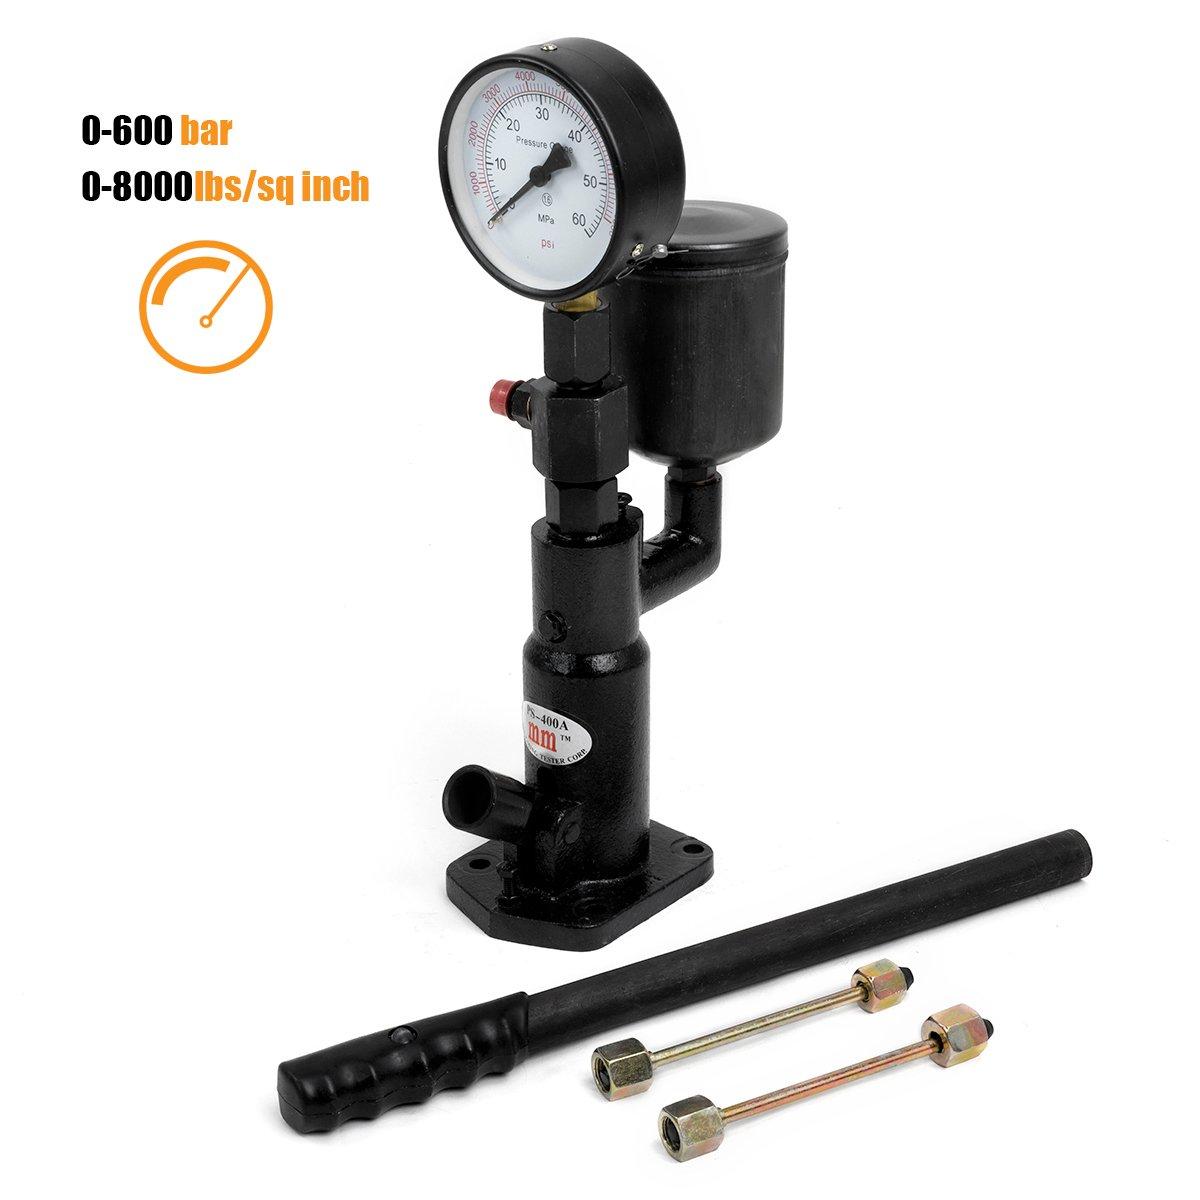 Diesel Injector Nozzle Tester Pop Pressure Tester